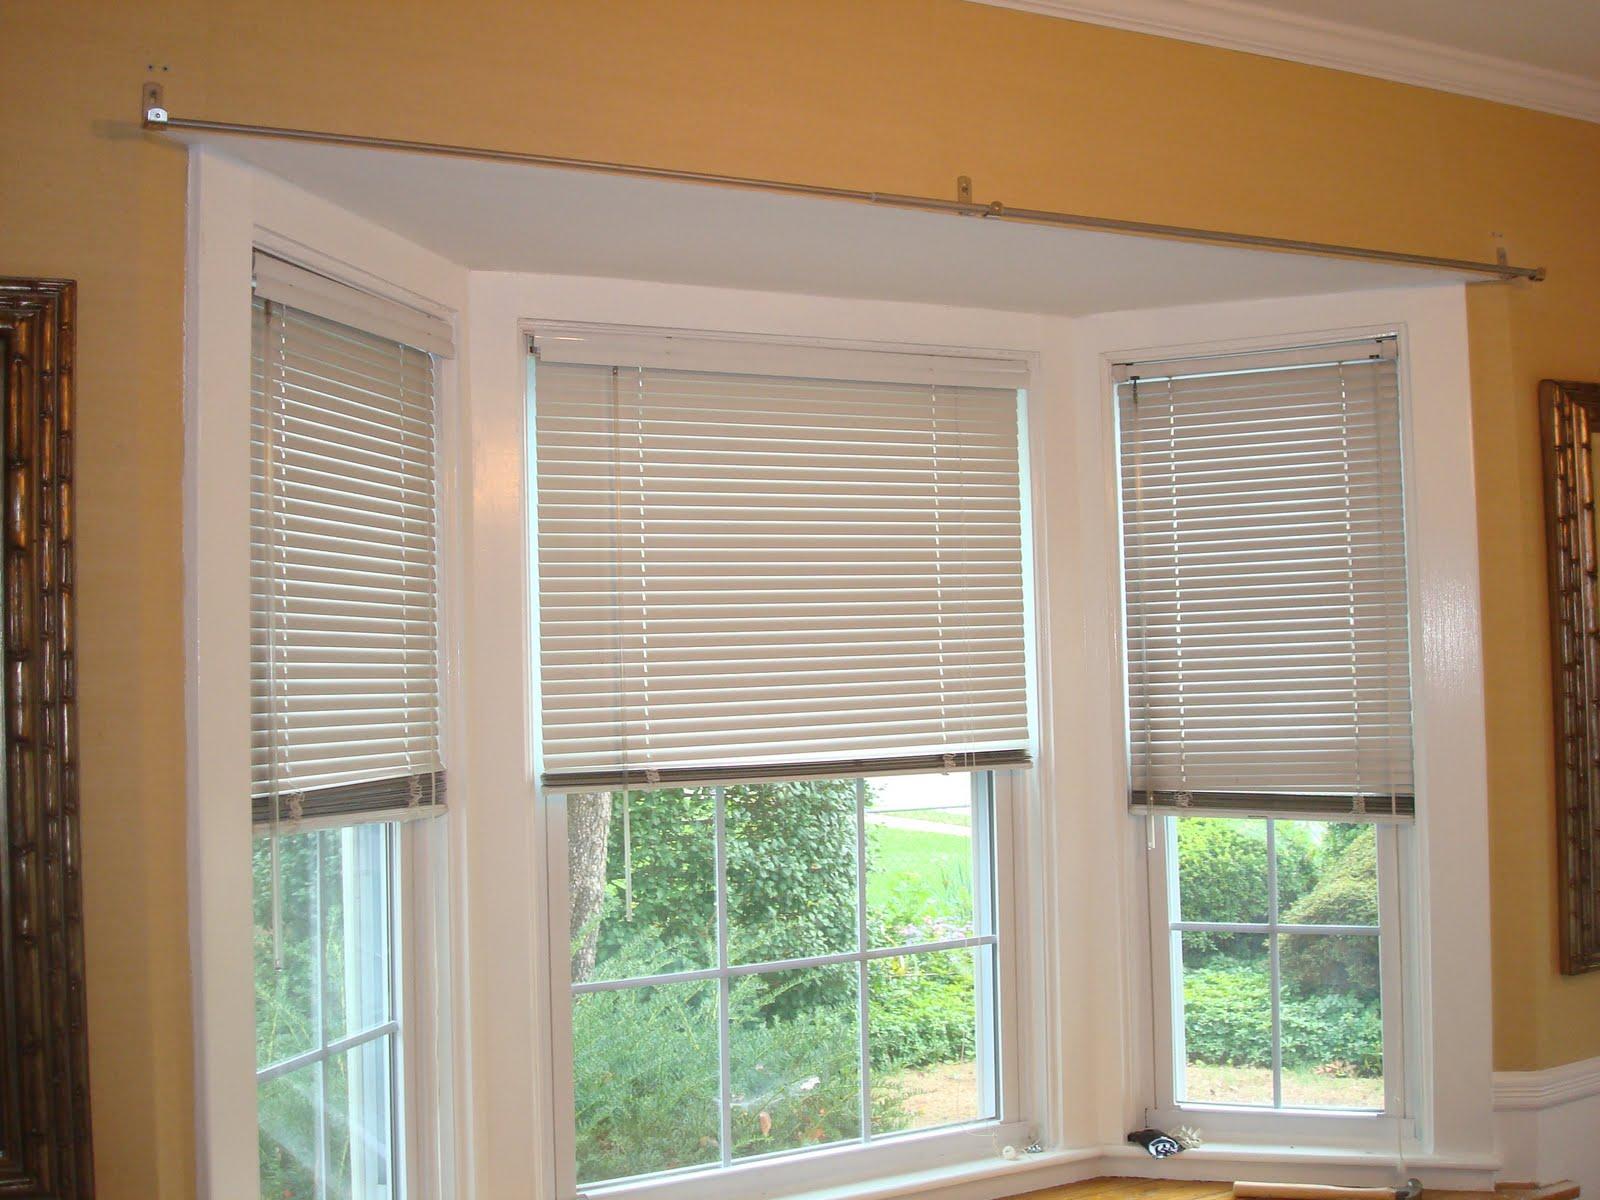 Diy Window Treatments Long Island Ny Effortless Style